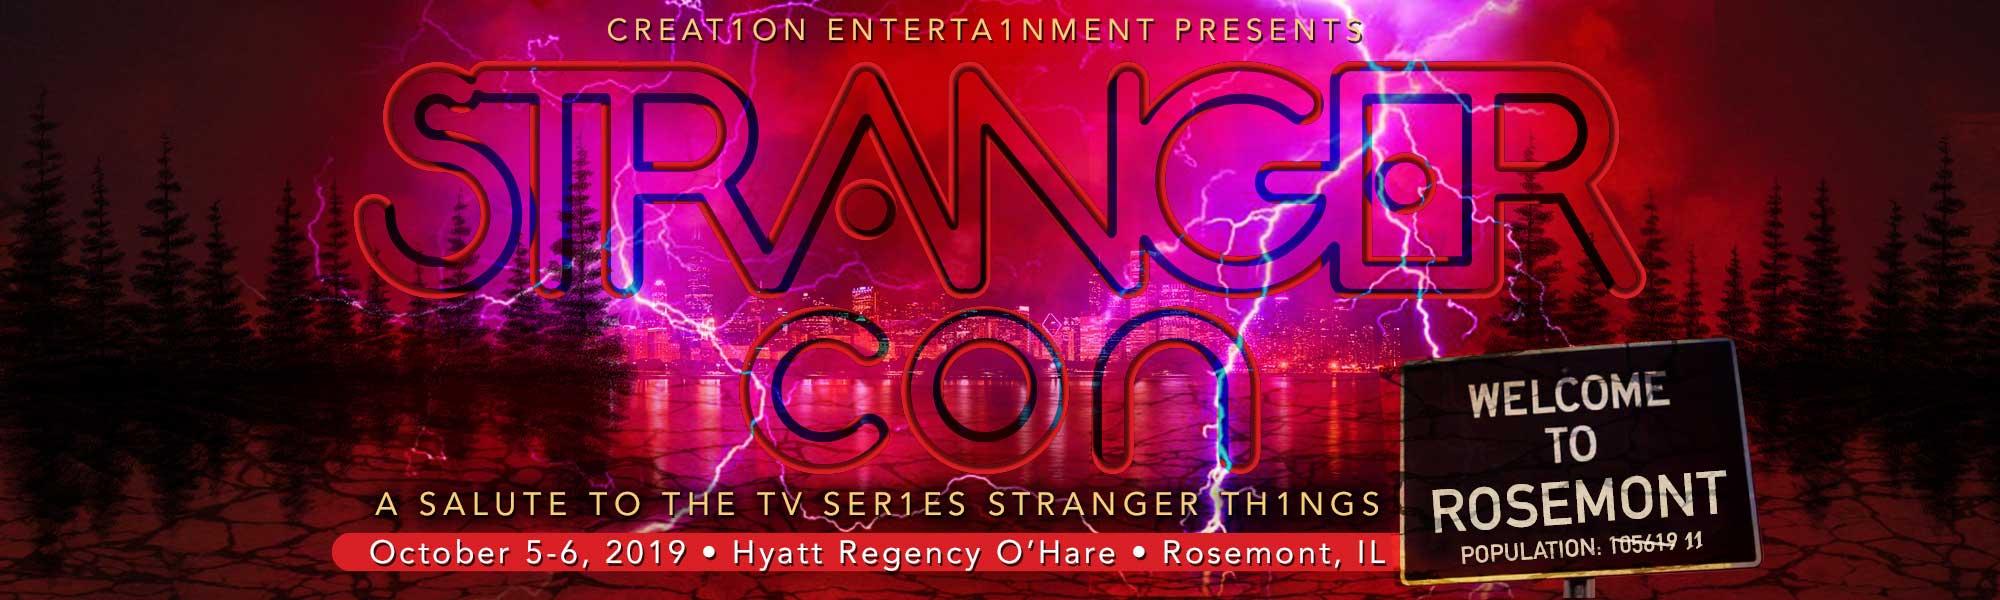 Creation Entertainment presents STRANGER CON a salute to the